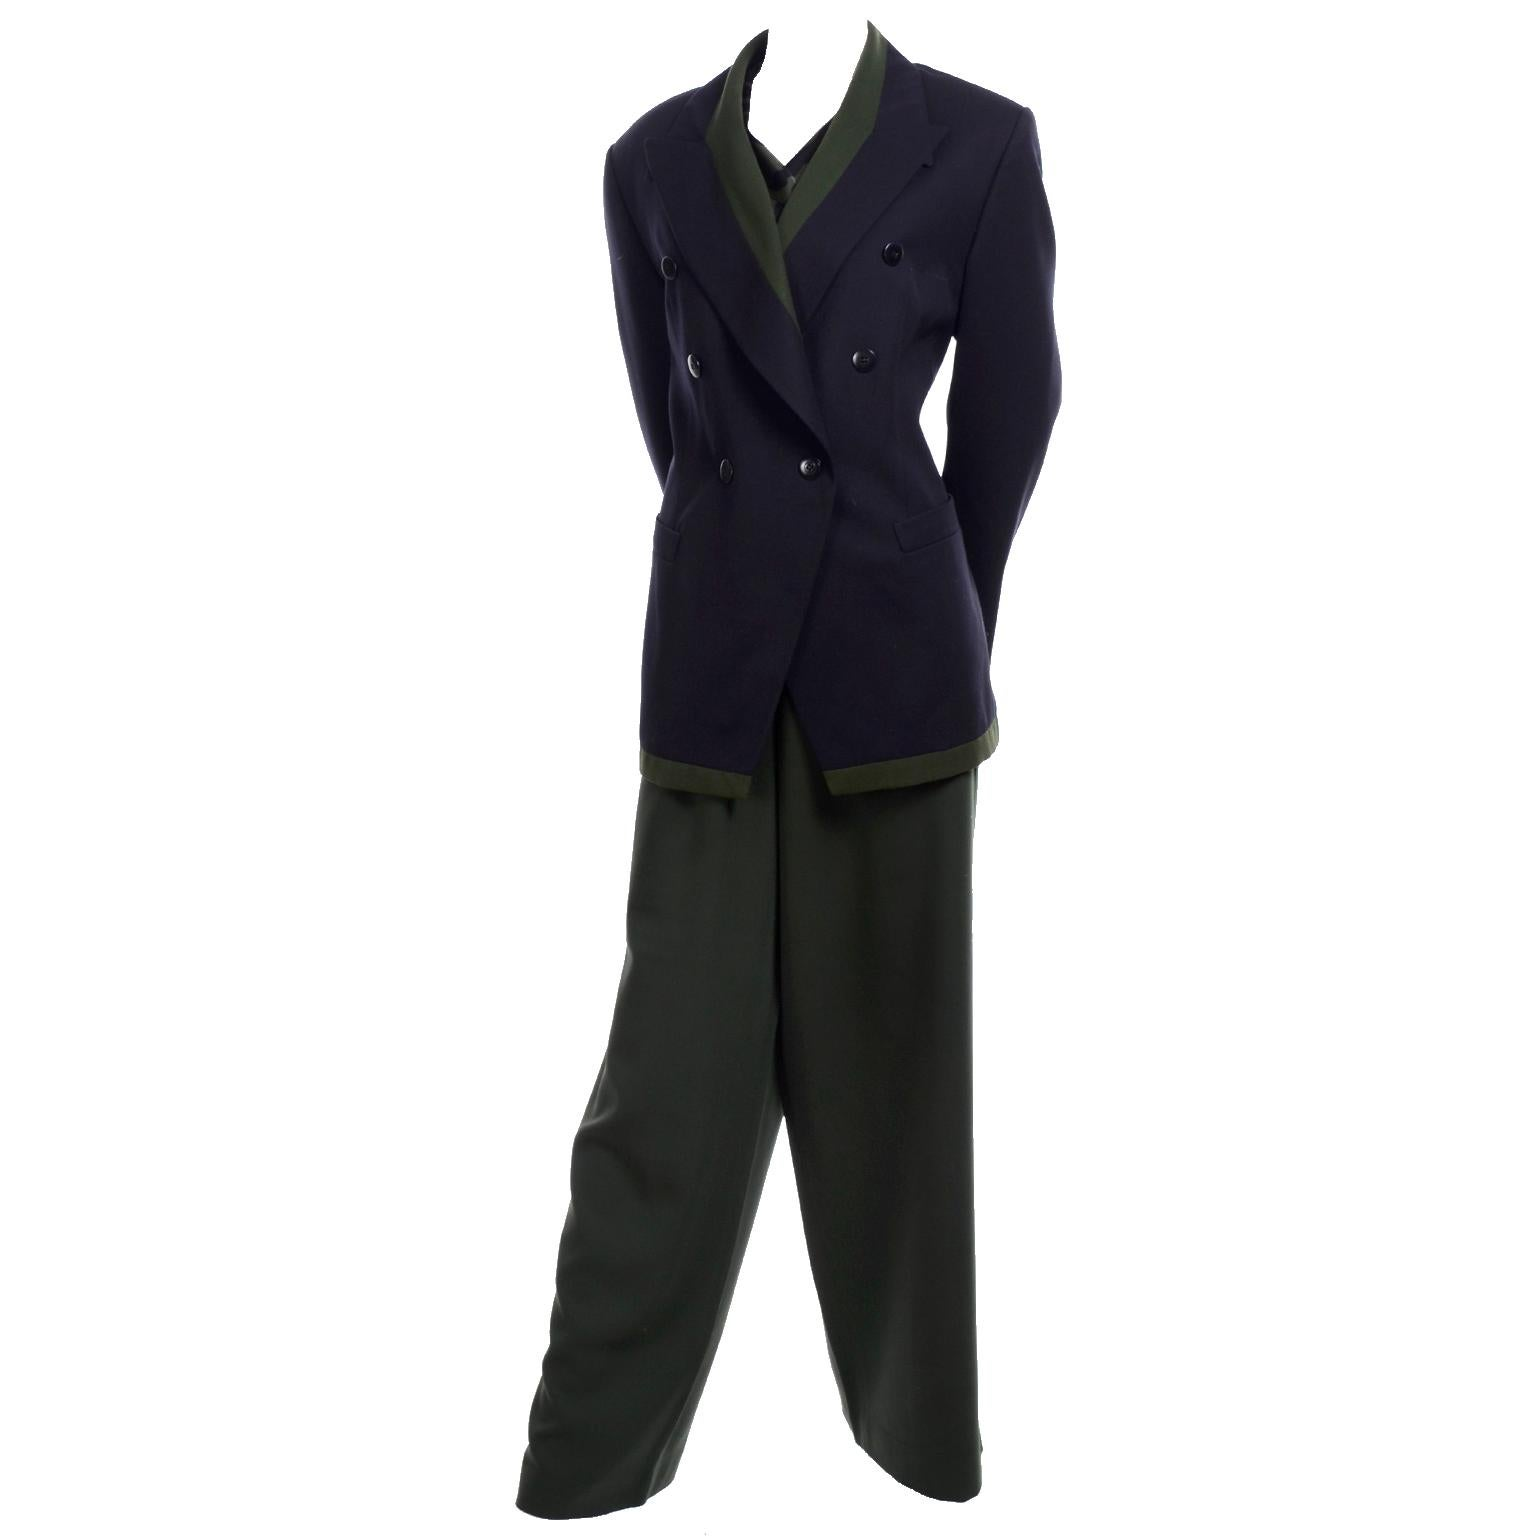 1980s Escada Navy Blue & Green 3 pc Trouser Pant Suit & Animal Print Silk Blouse